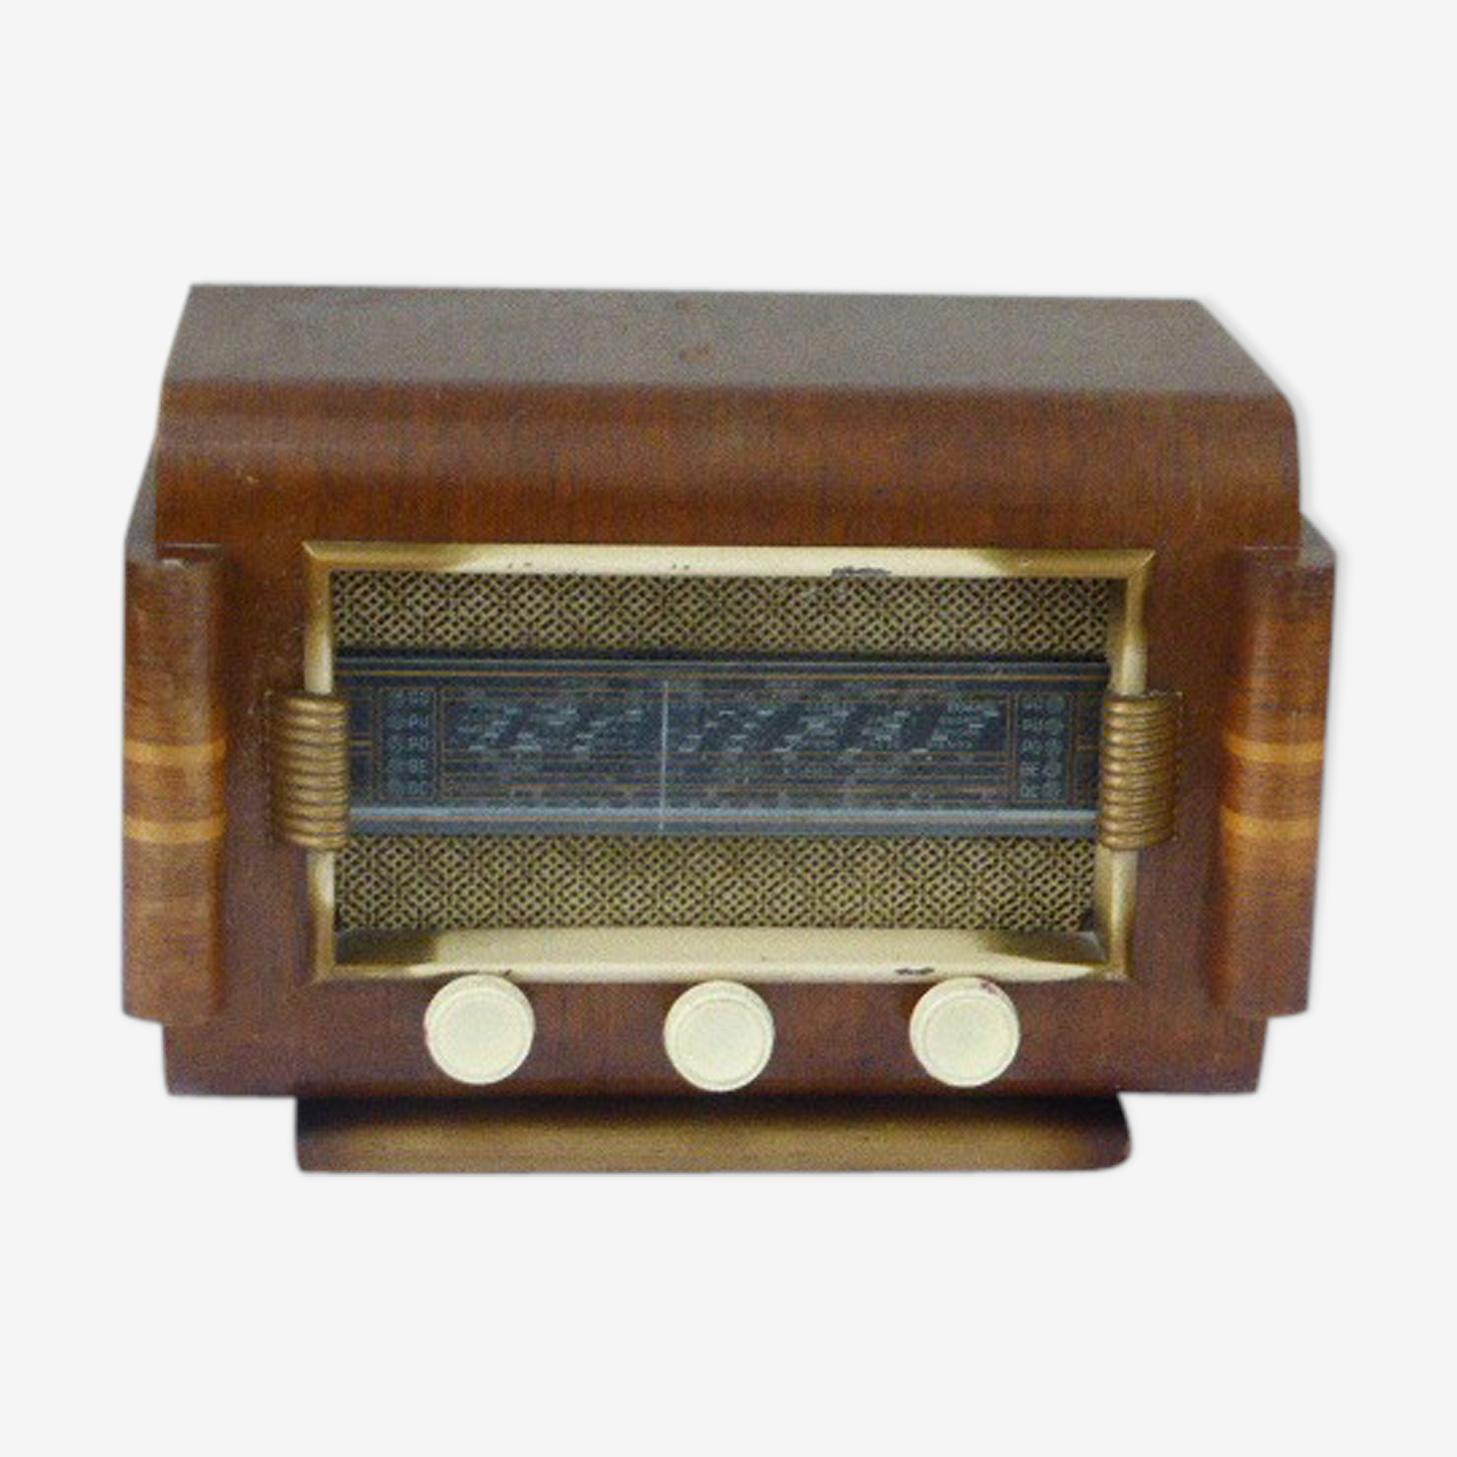 Radio en bois marqueté, vintage 1950